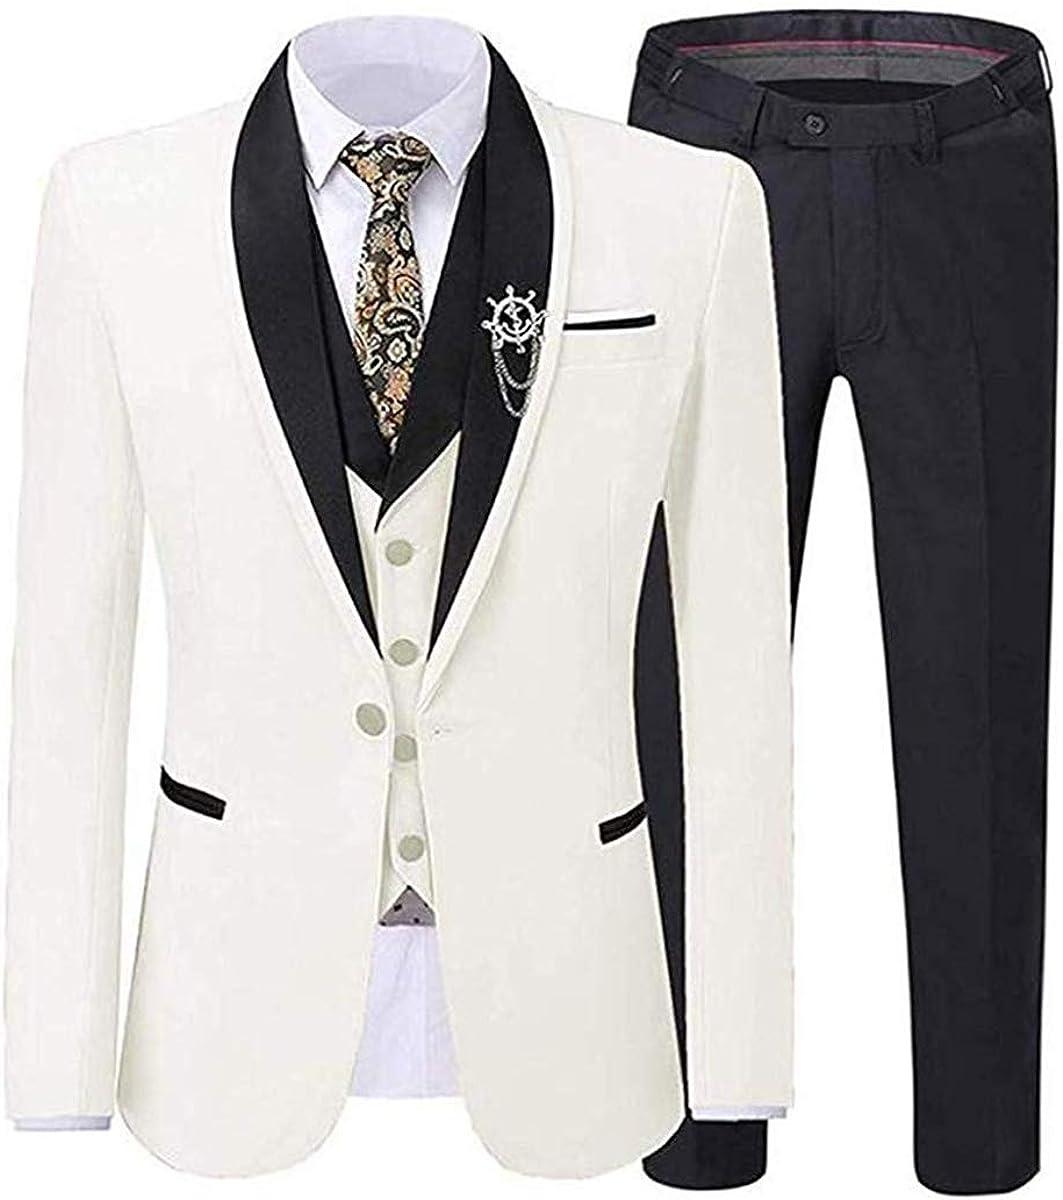 Wemaliyzd Men's 3 Piece Business Suit 1 Button Jacket Single Breated Vest Pants